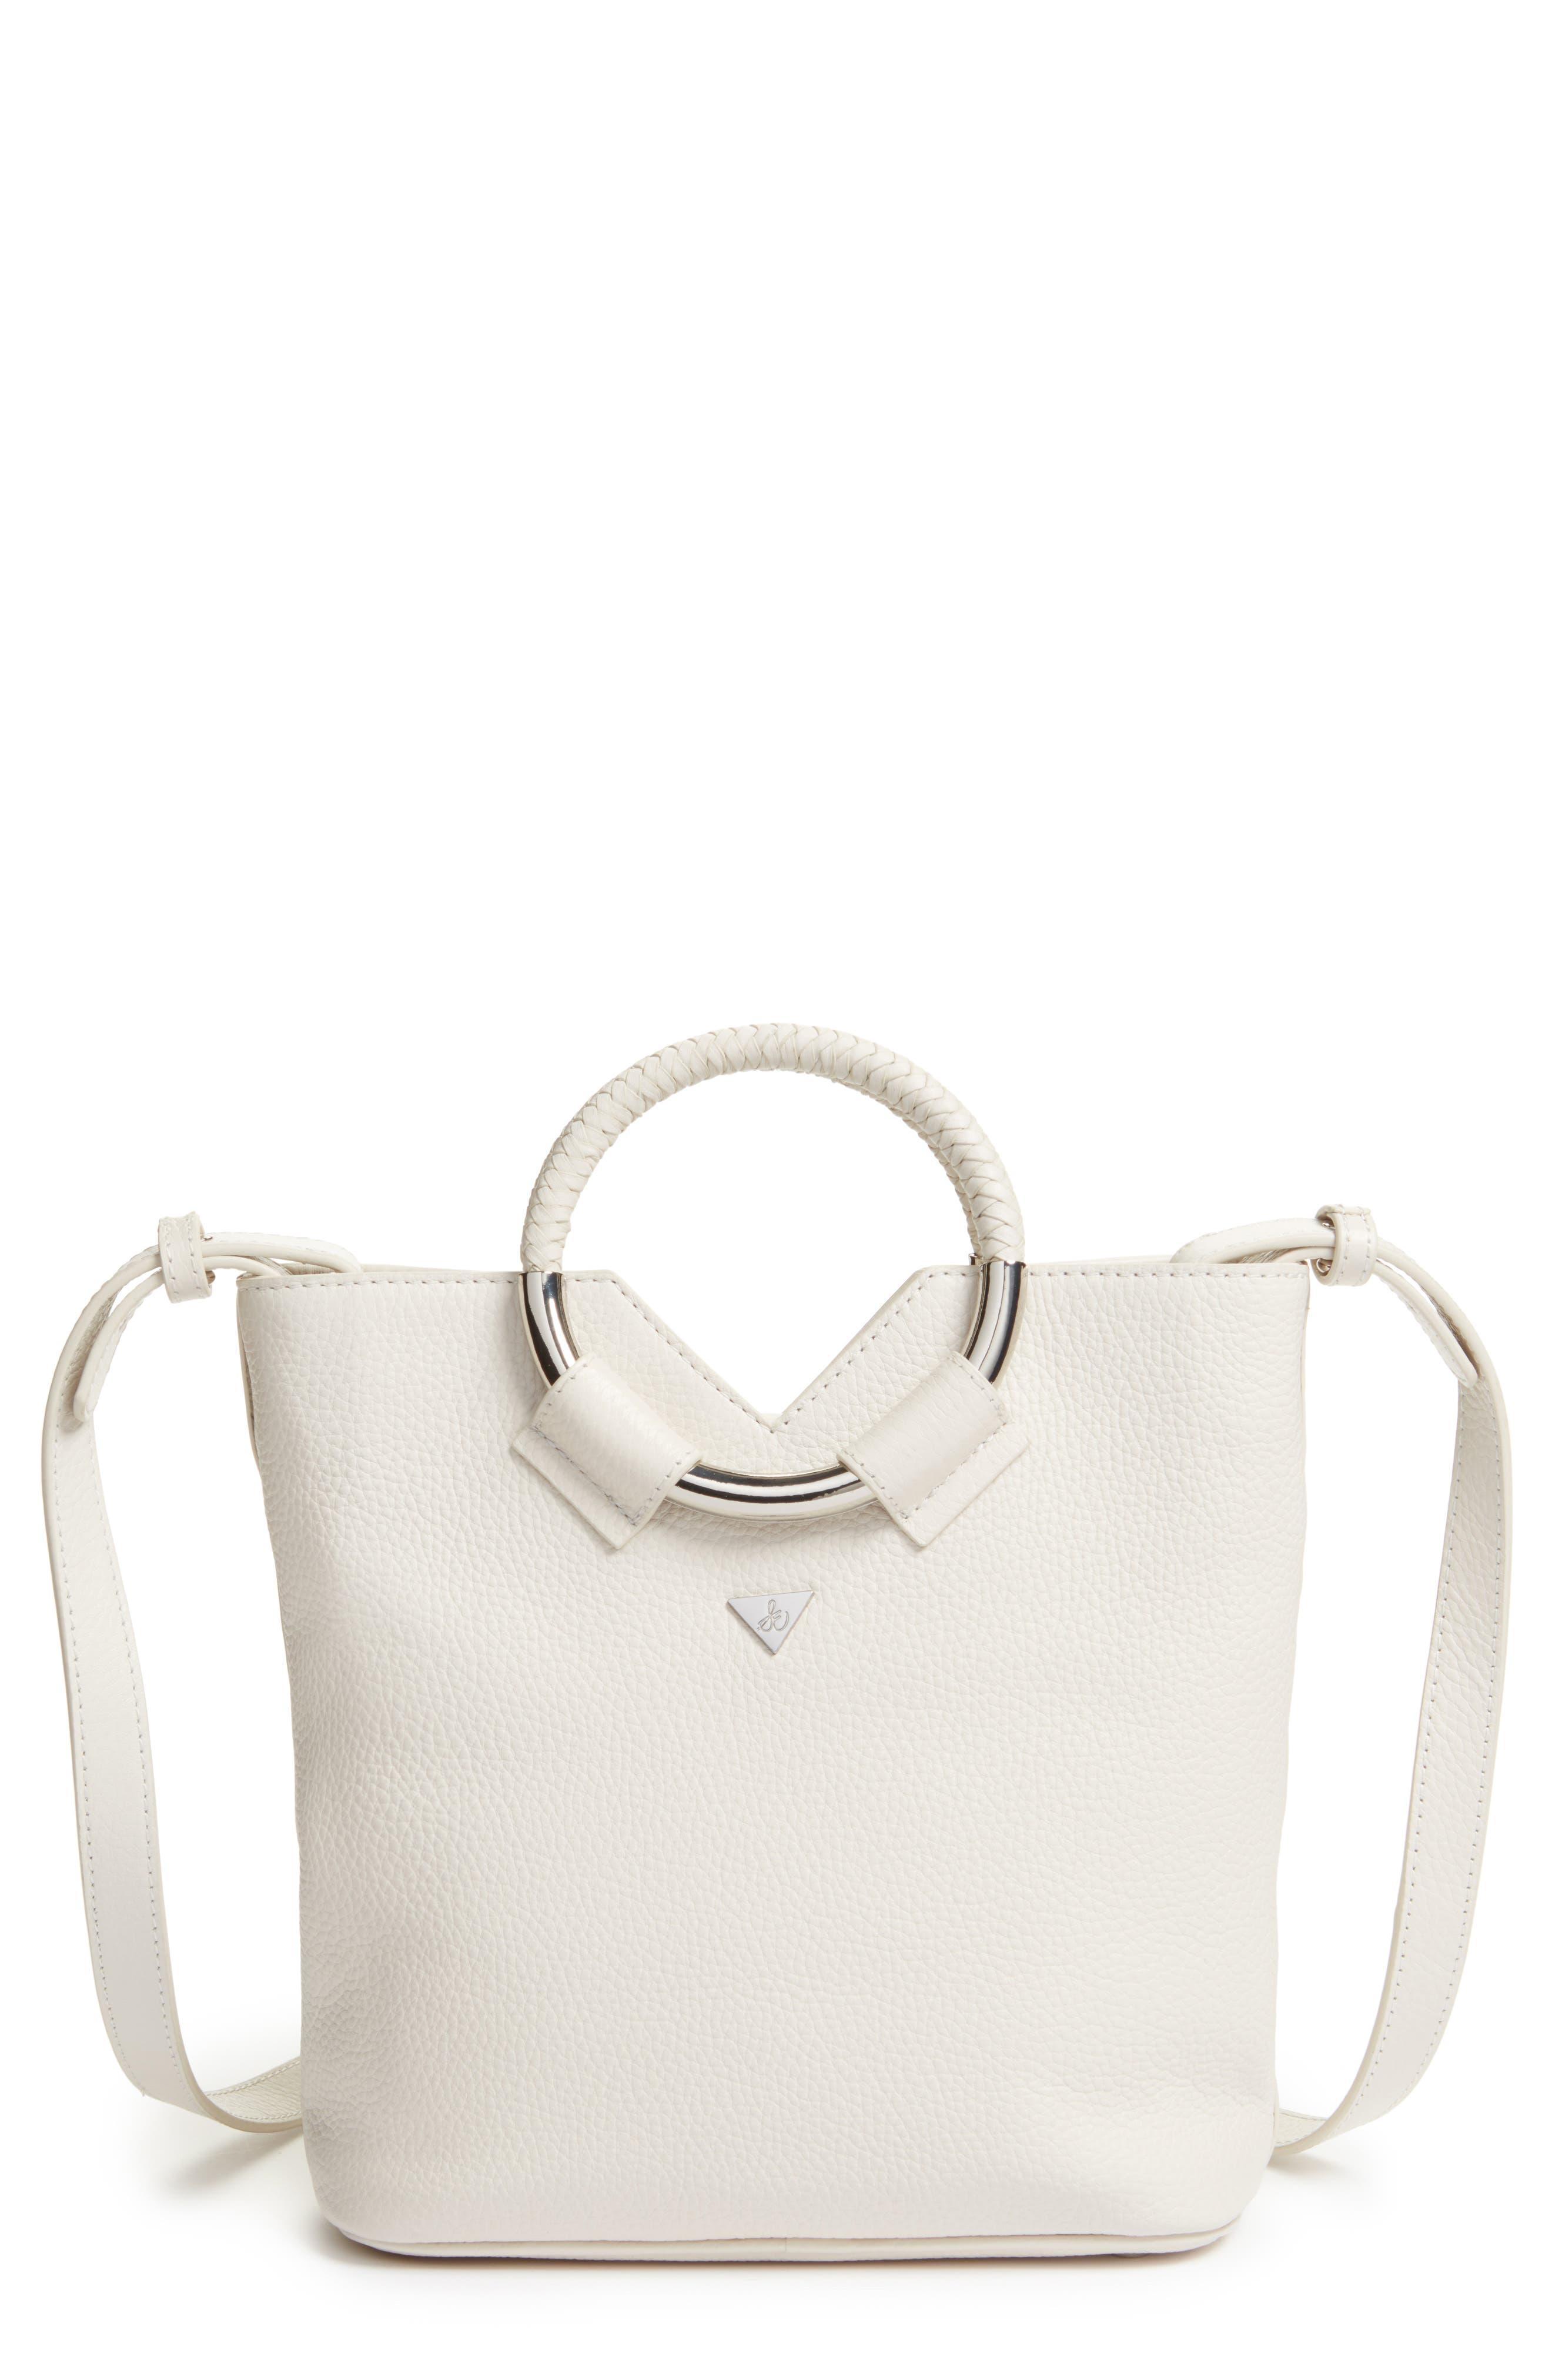 Sam Edelman Small Elina Leather Crossbody Bag